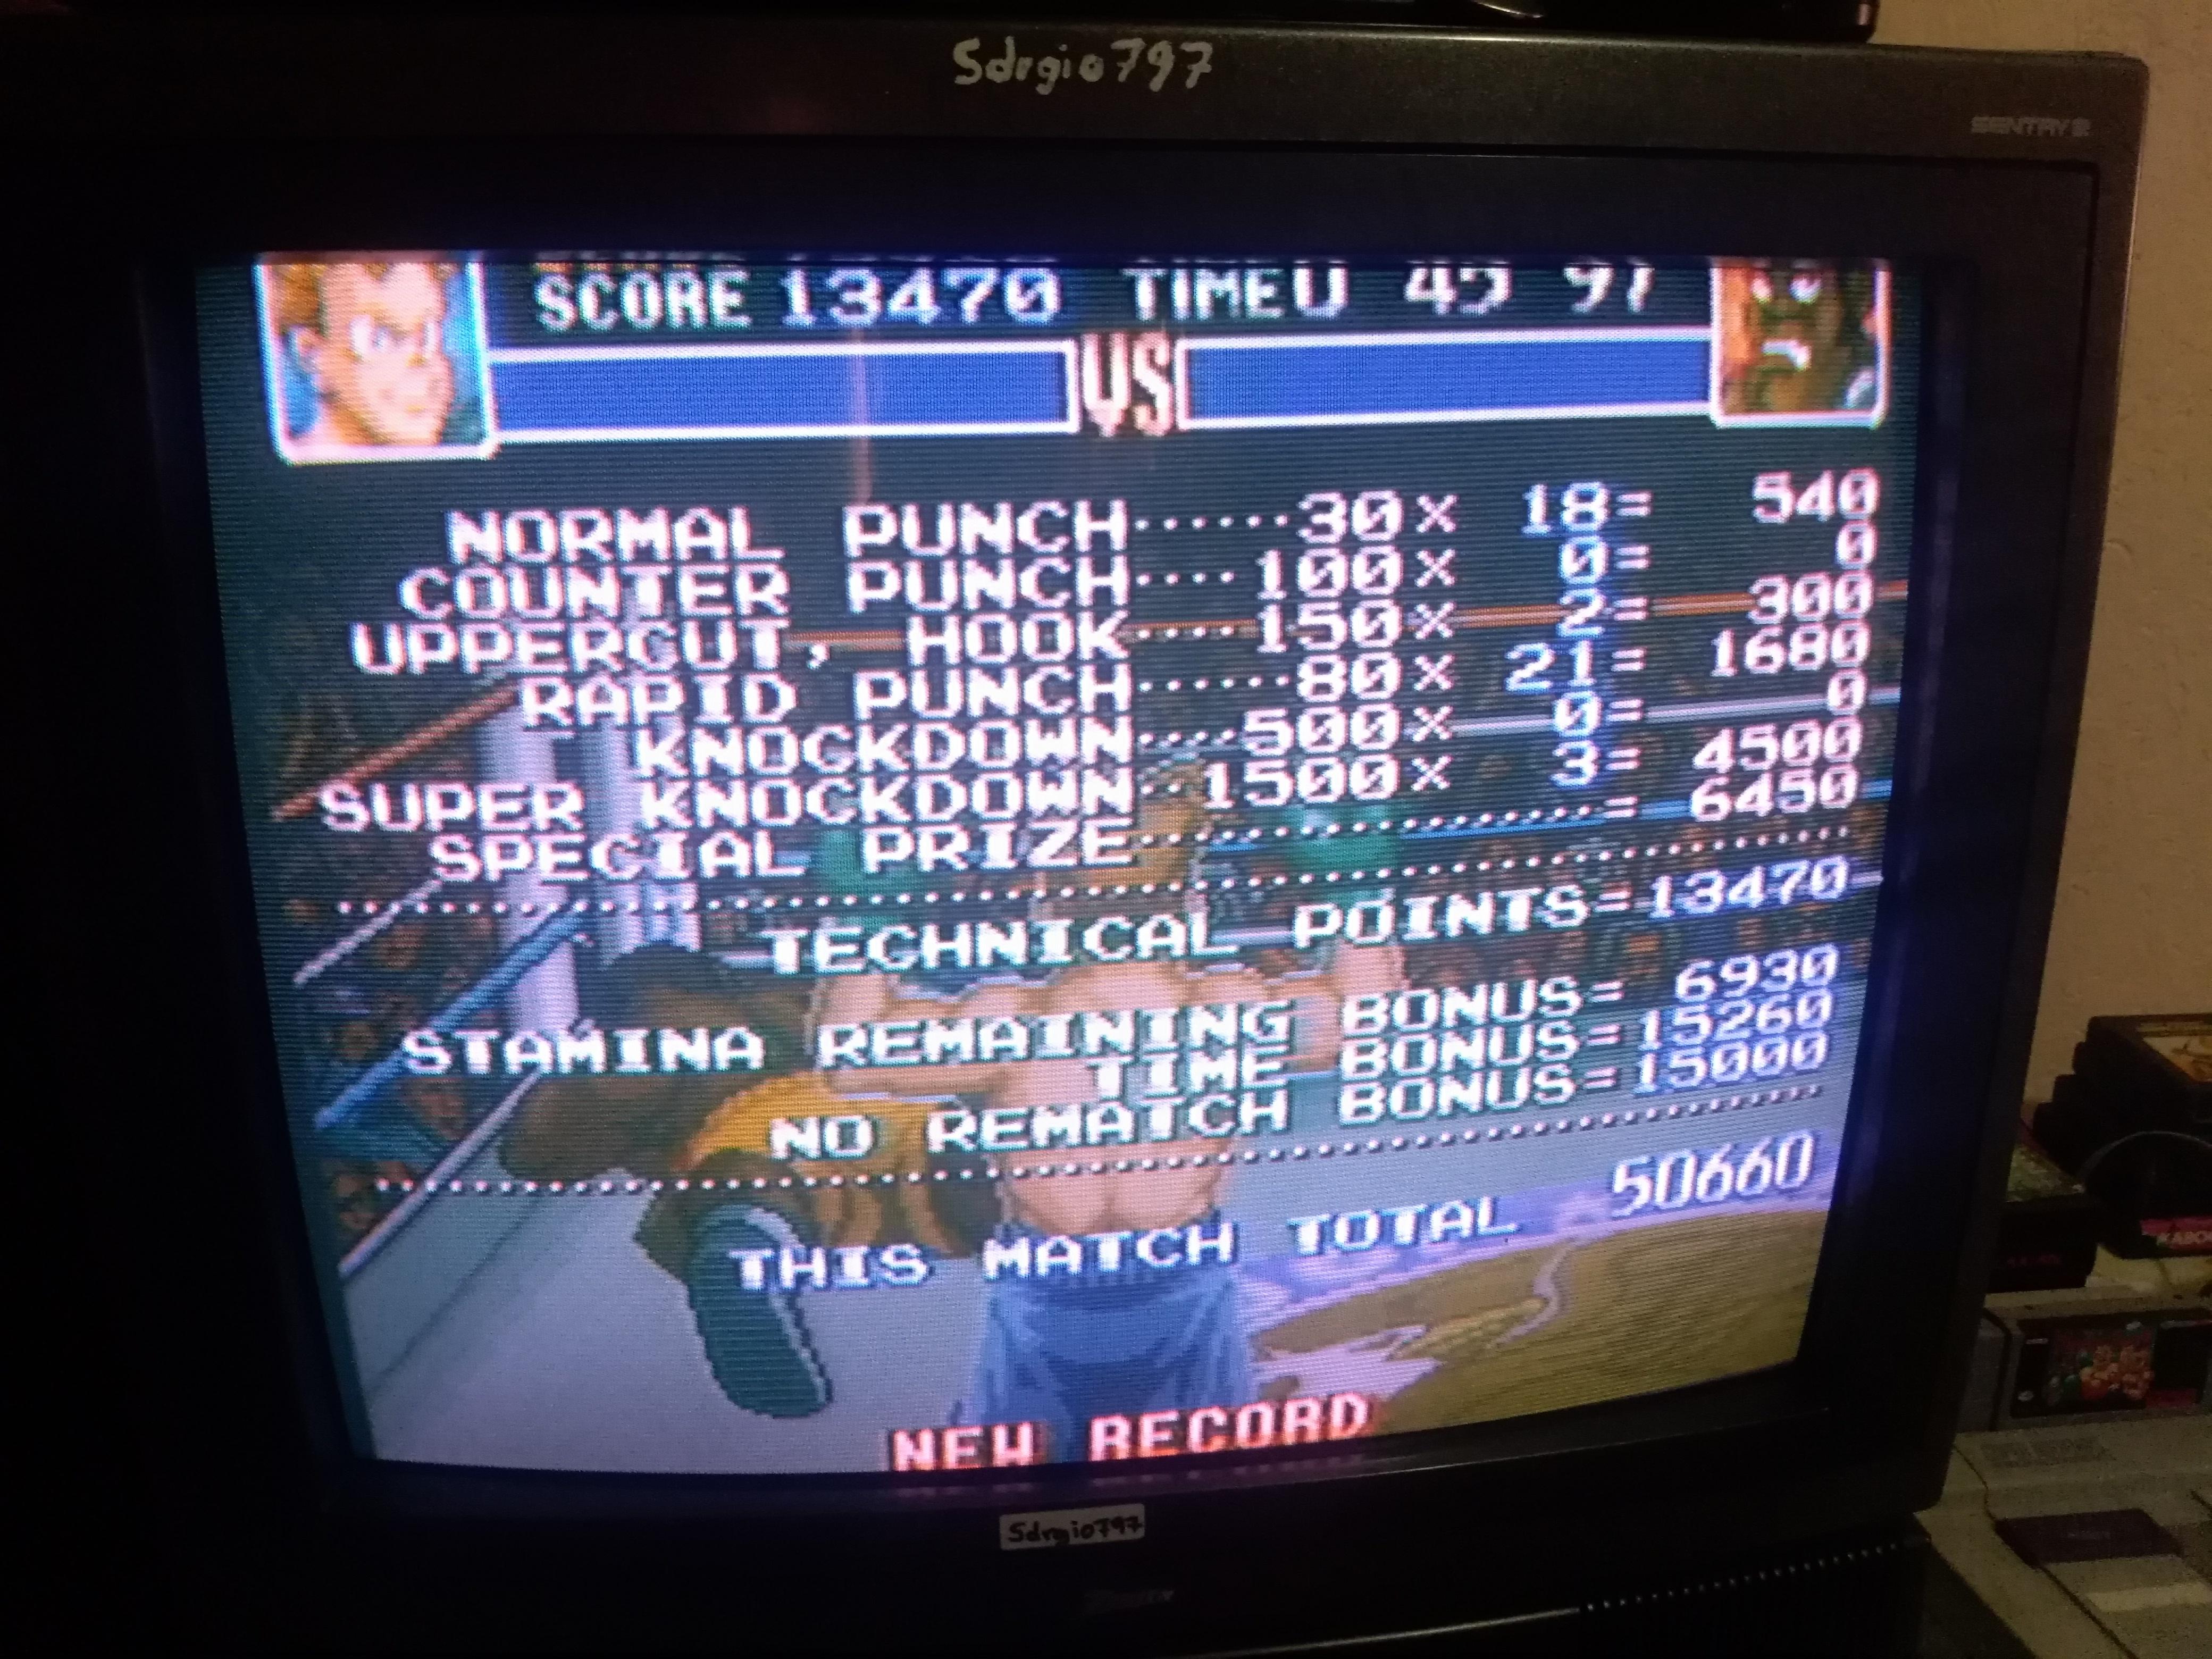 Sdrgio797: Super Punch-Out!! [Mr. Sandman] (SNES/Super Famicom) 50,660 points on 2020-07-06 15:06:11